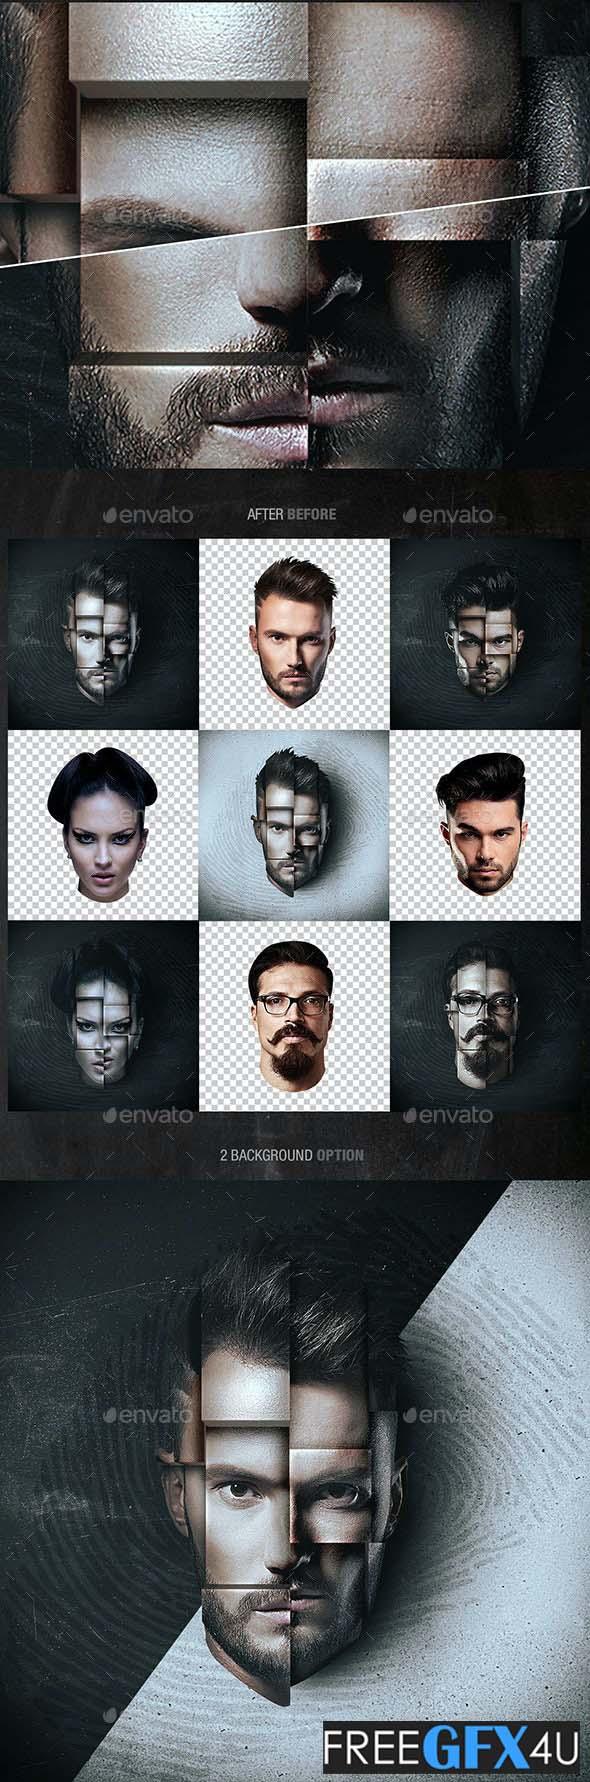 Graphicriver - 3D Face Mockup PSD Photo